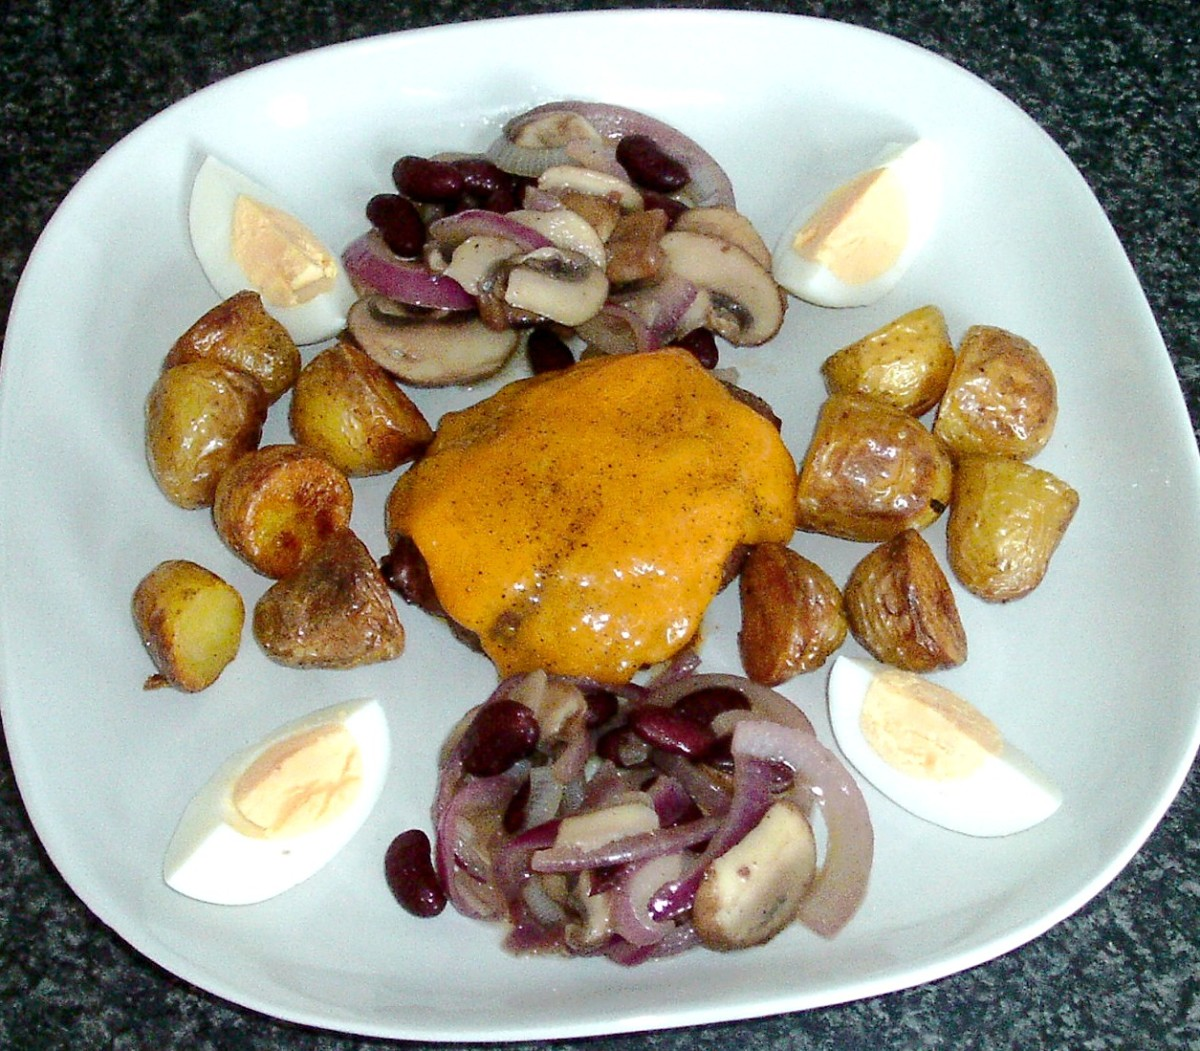 Buffalo and beef cheeseburger with deep fried potatoes and warm bean salad